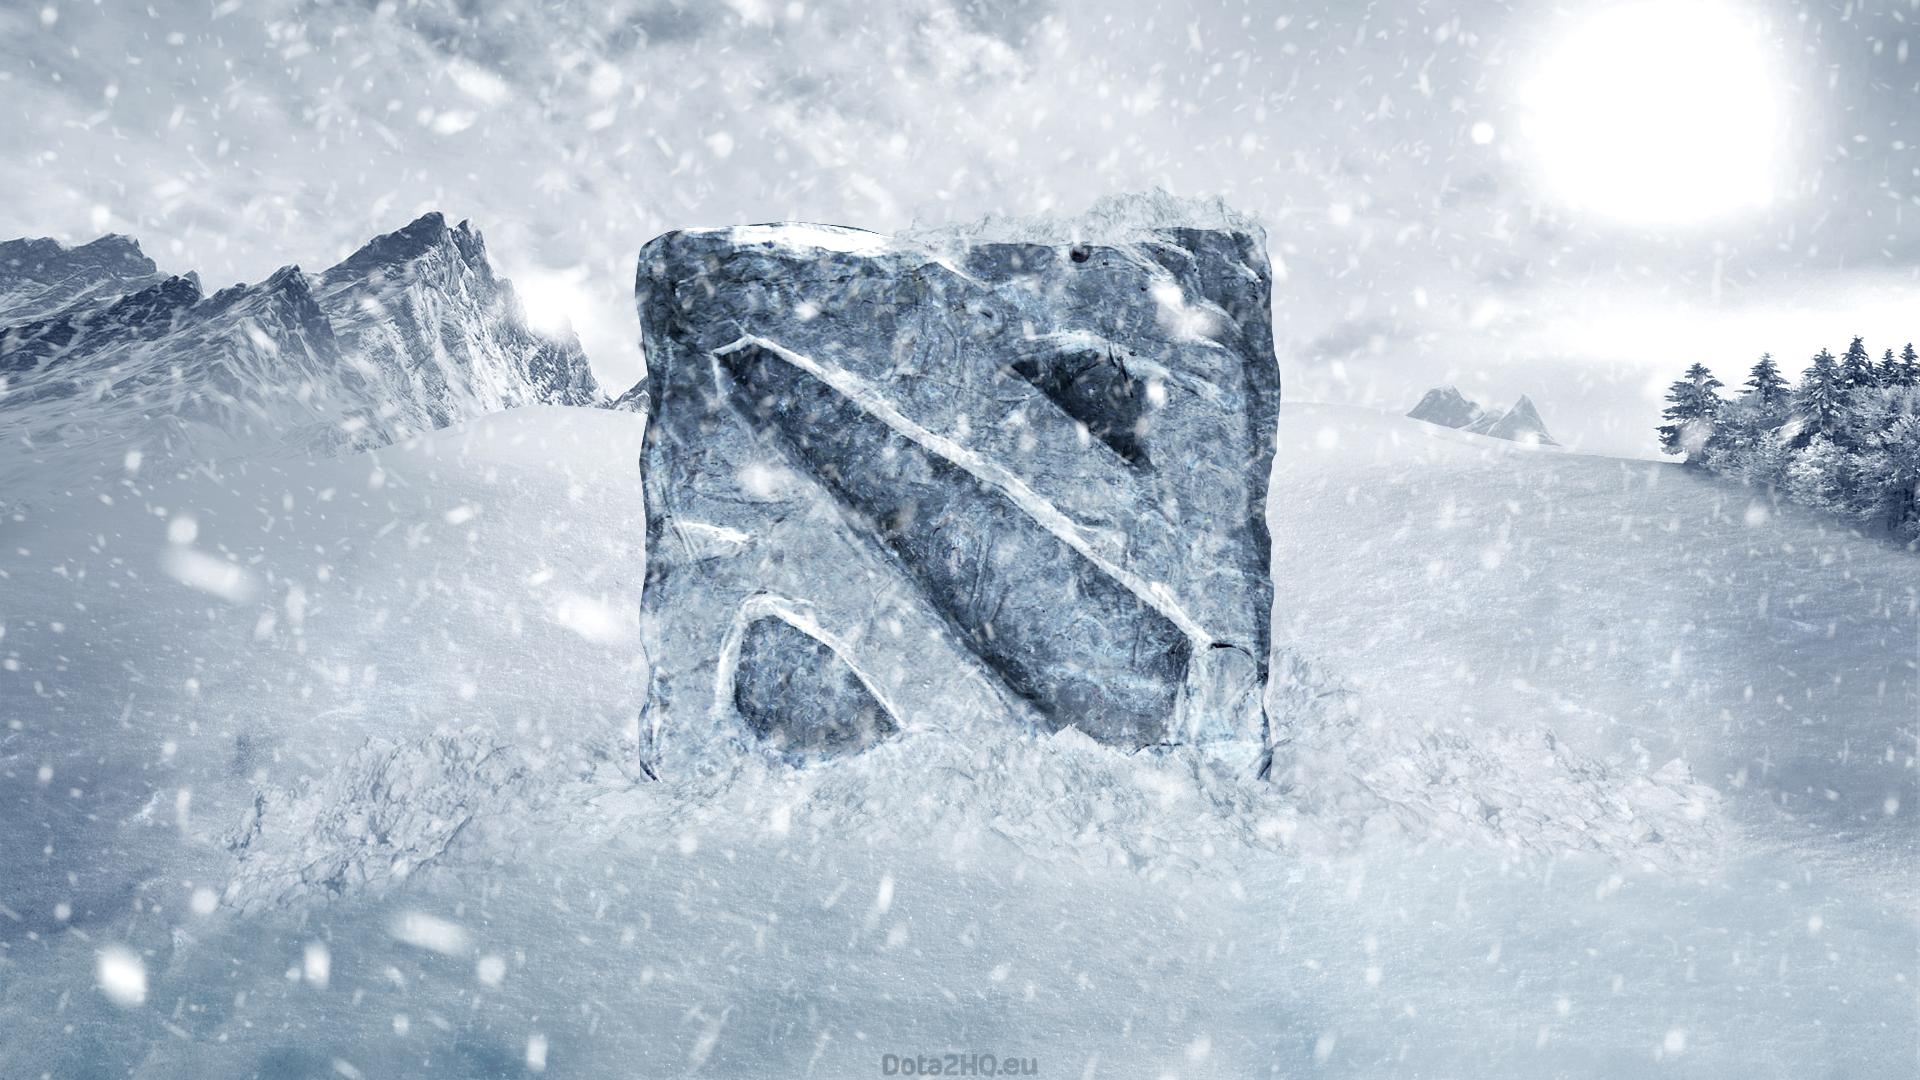 Snow Winter Logo Ice Frost Dota 2 Freezing Weather Season Frozen Blizzard Geological Phenomenon Storm